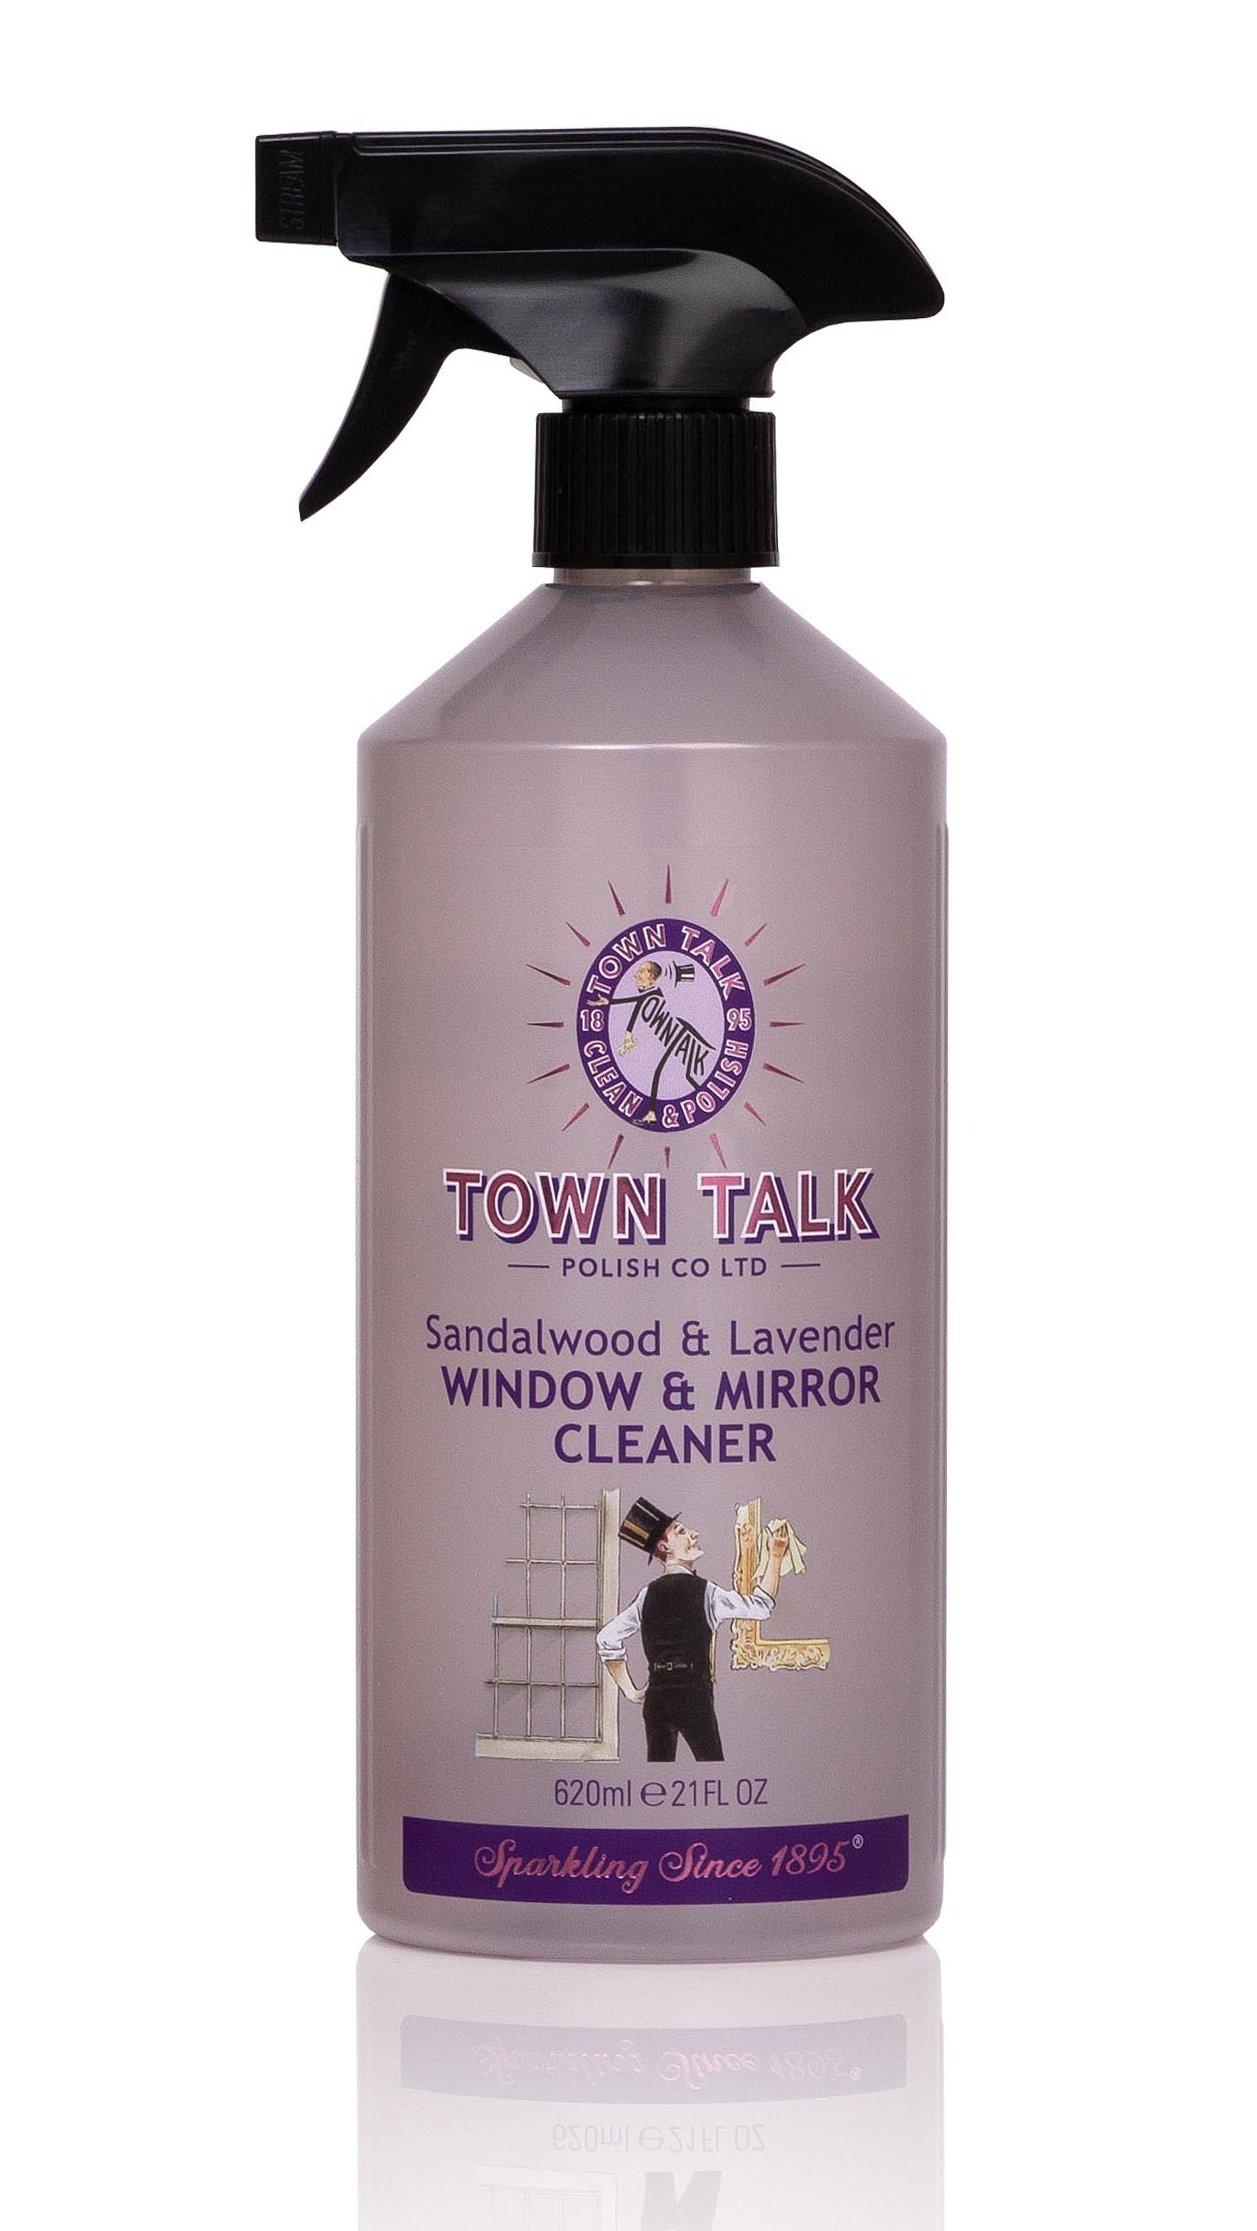 Mr Town Talk glasreiniger sandelhout en lavendel 620ml